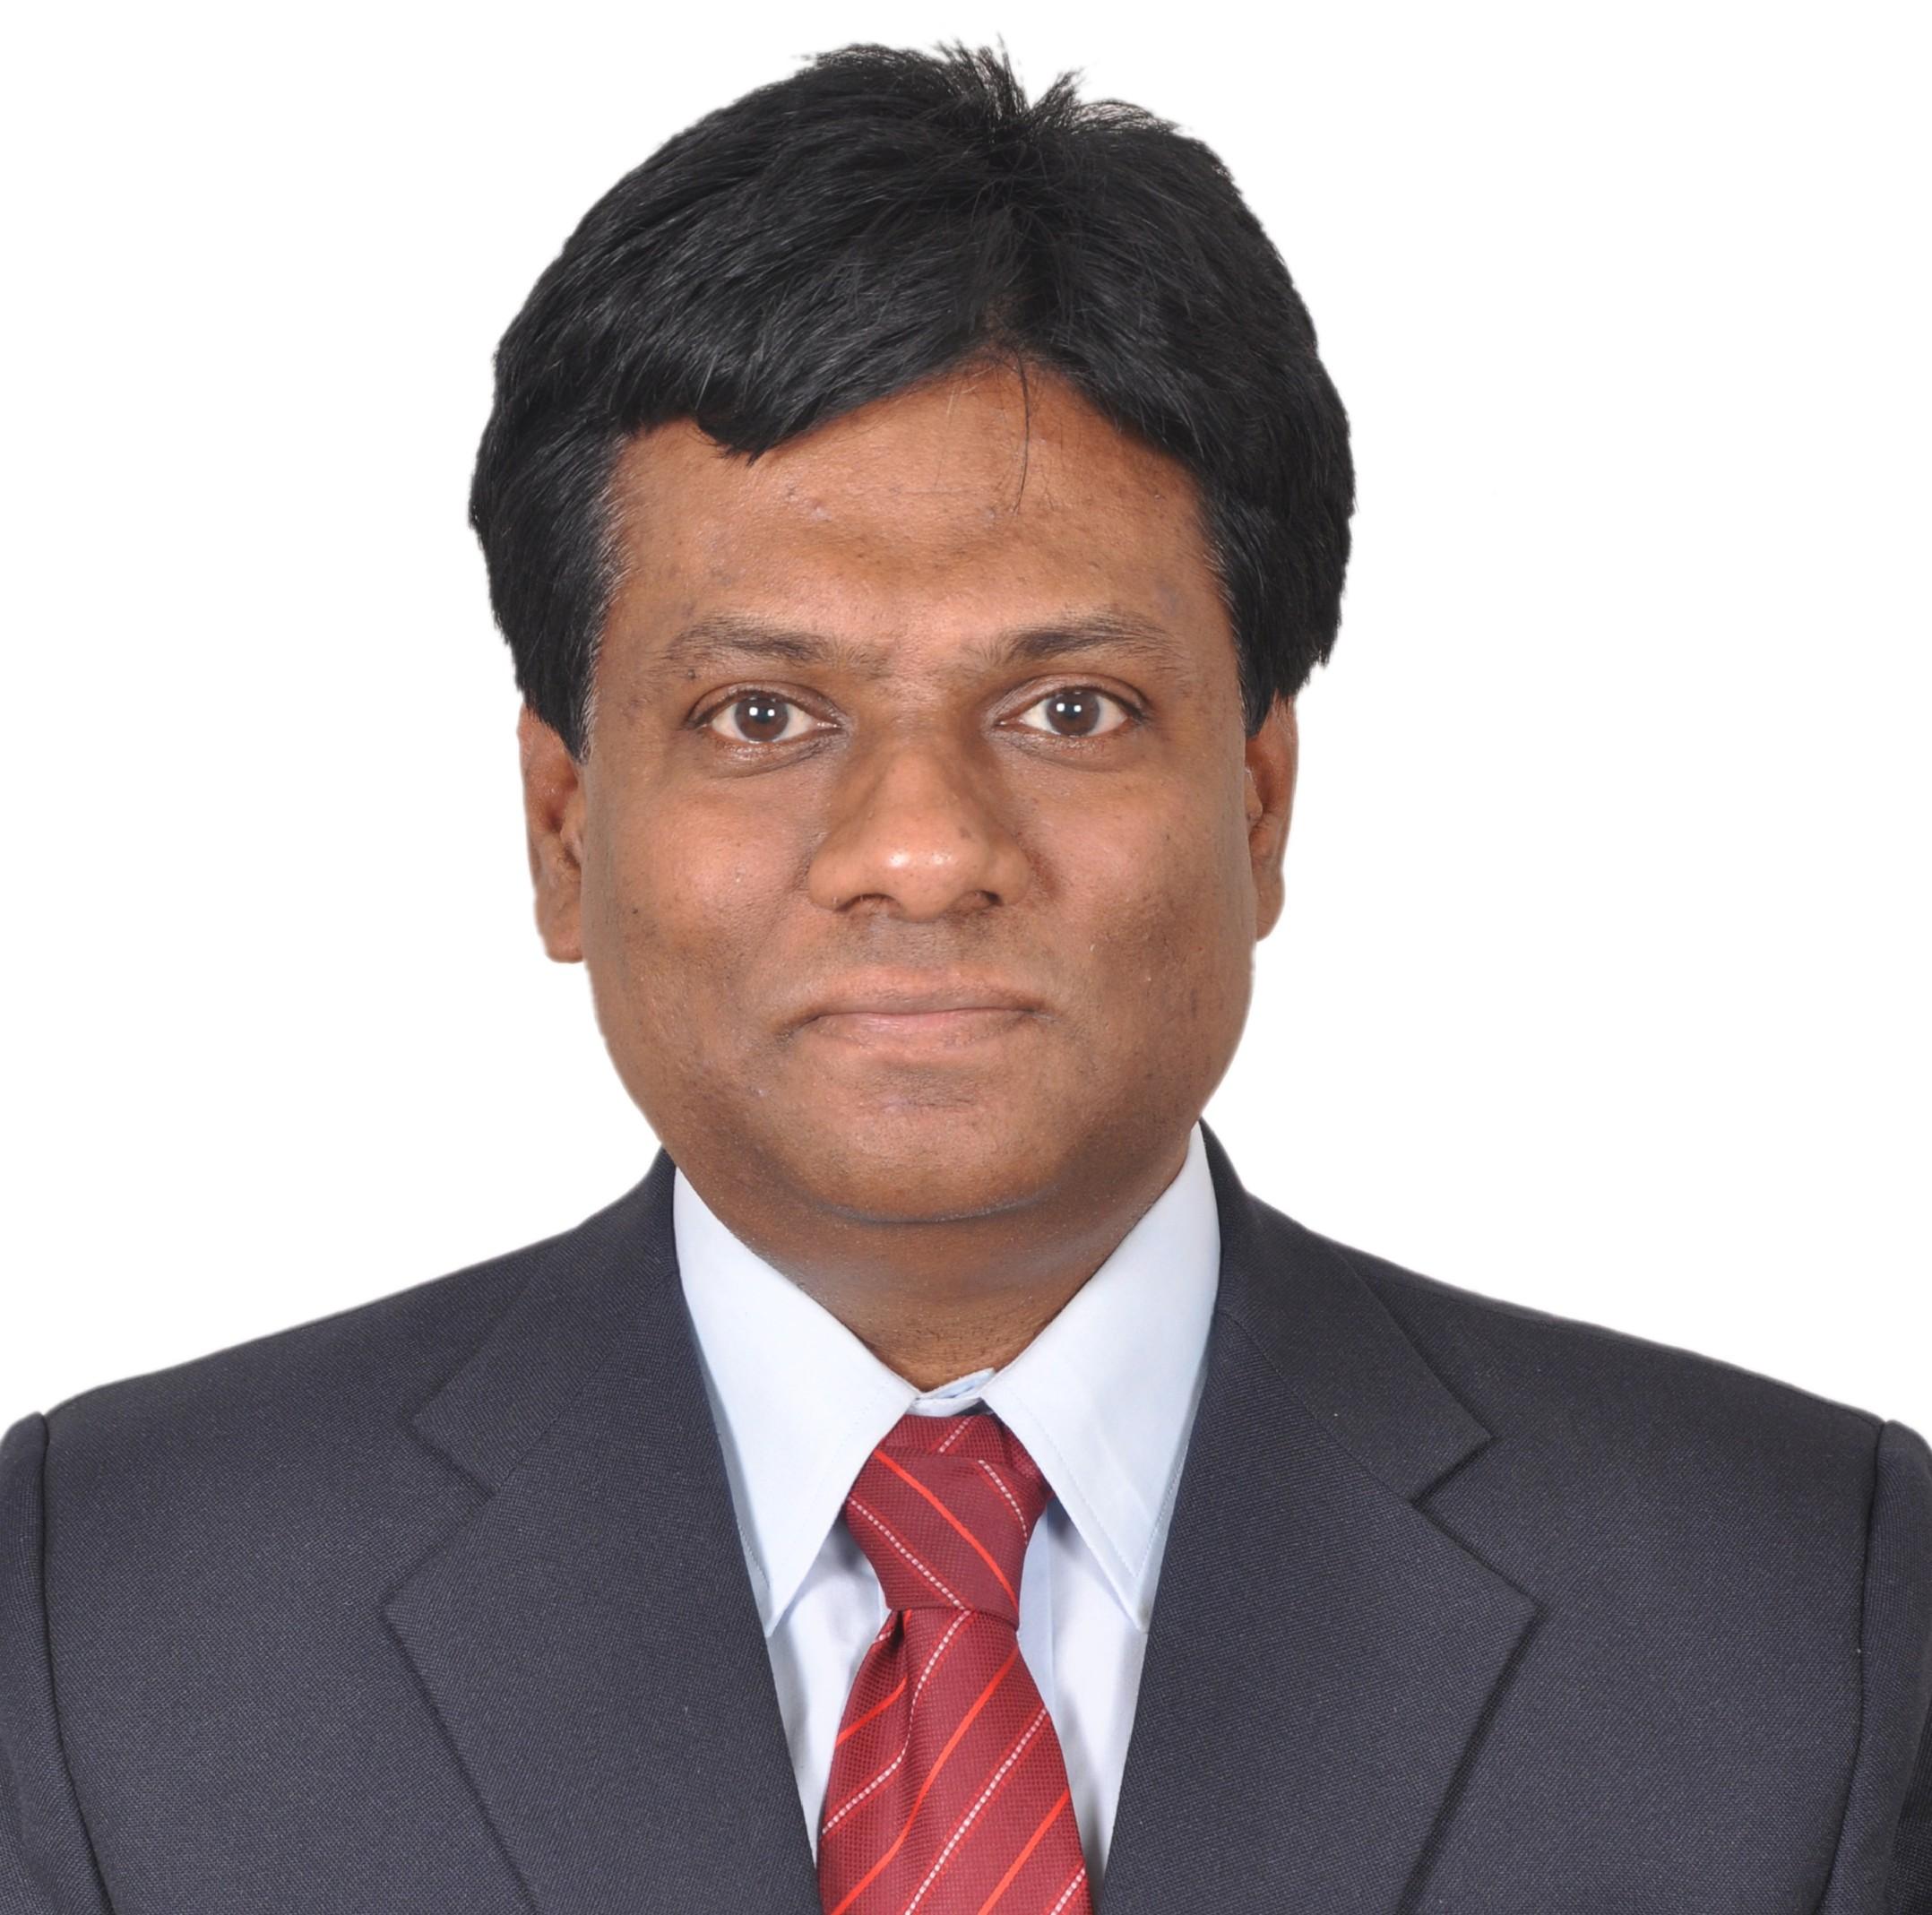 Prof. Sundarapandian Vaidyanathan